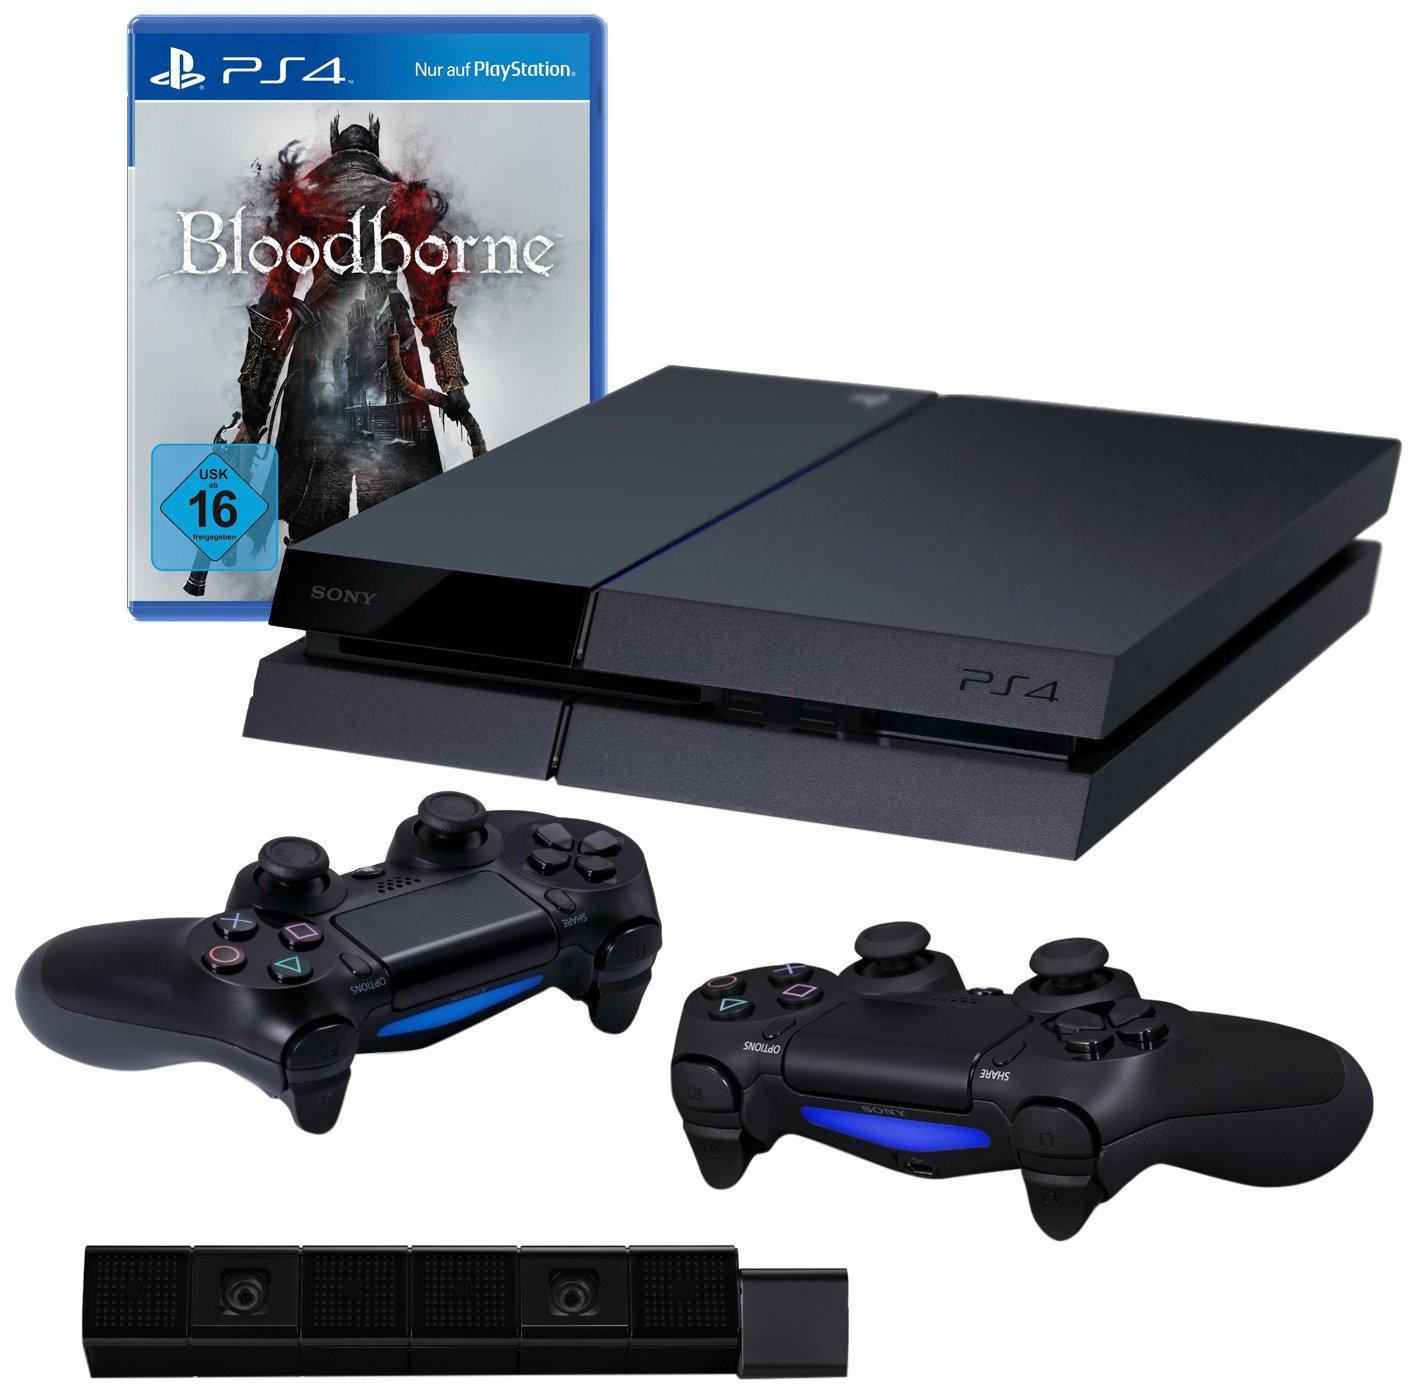 Console PS4 + Bloodborne + 2 manettes  + Caméra